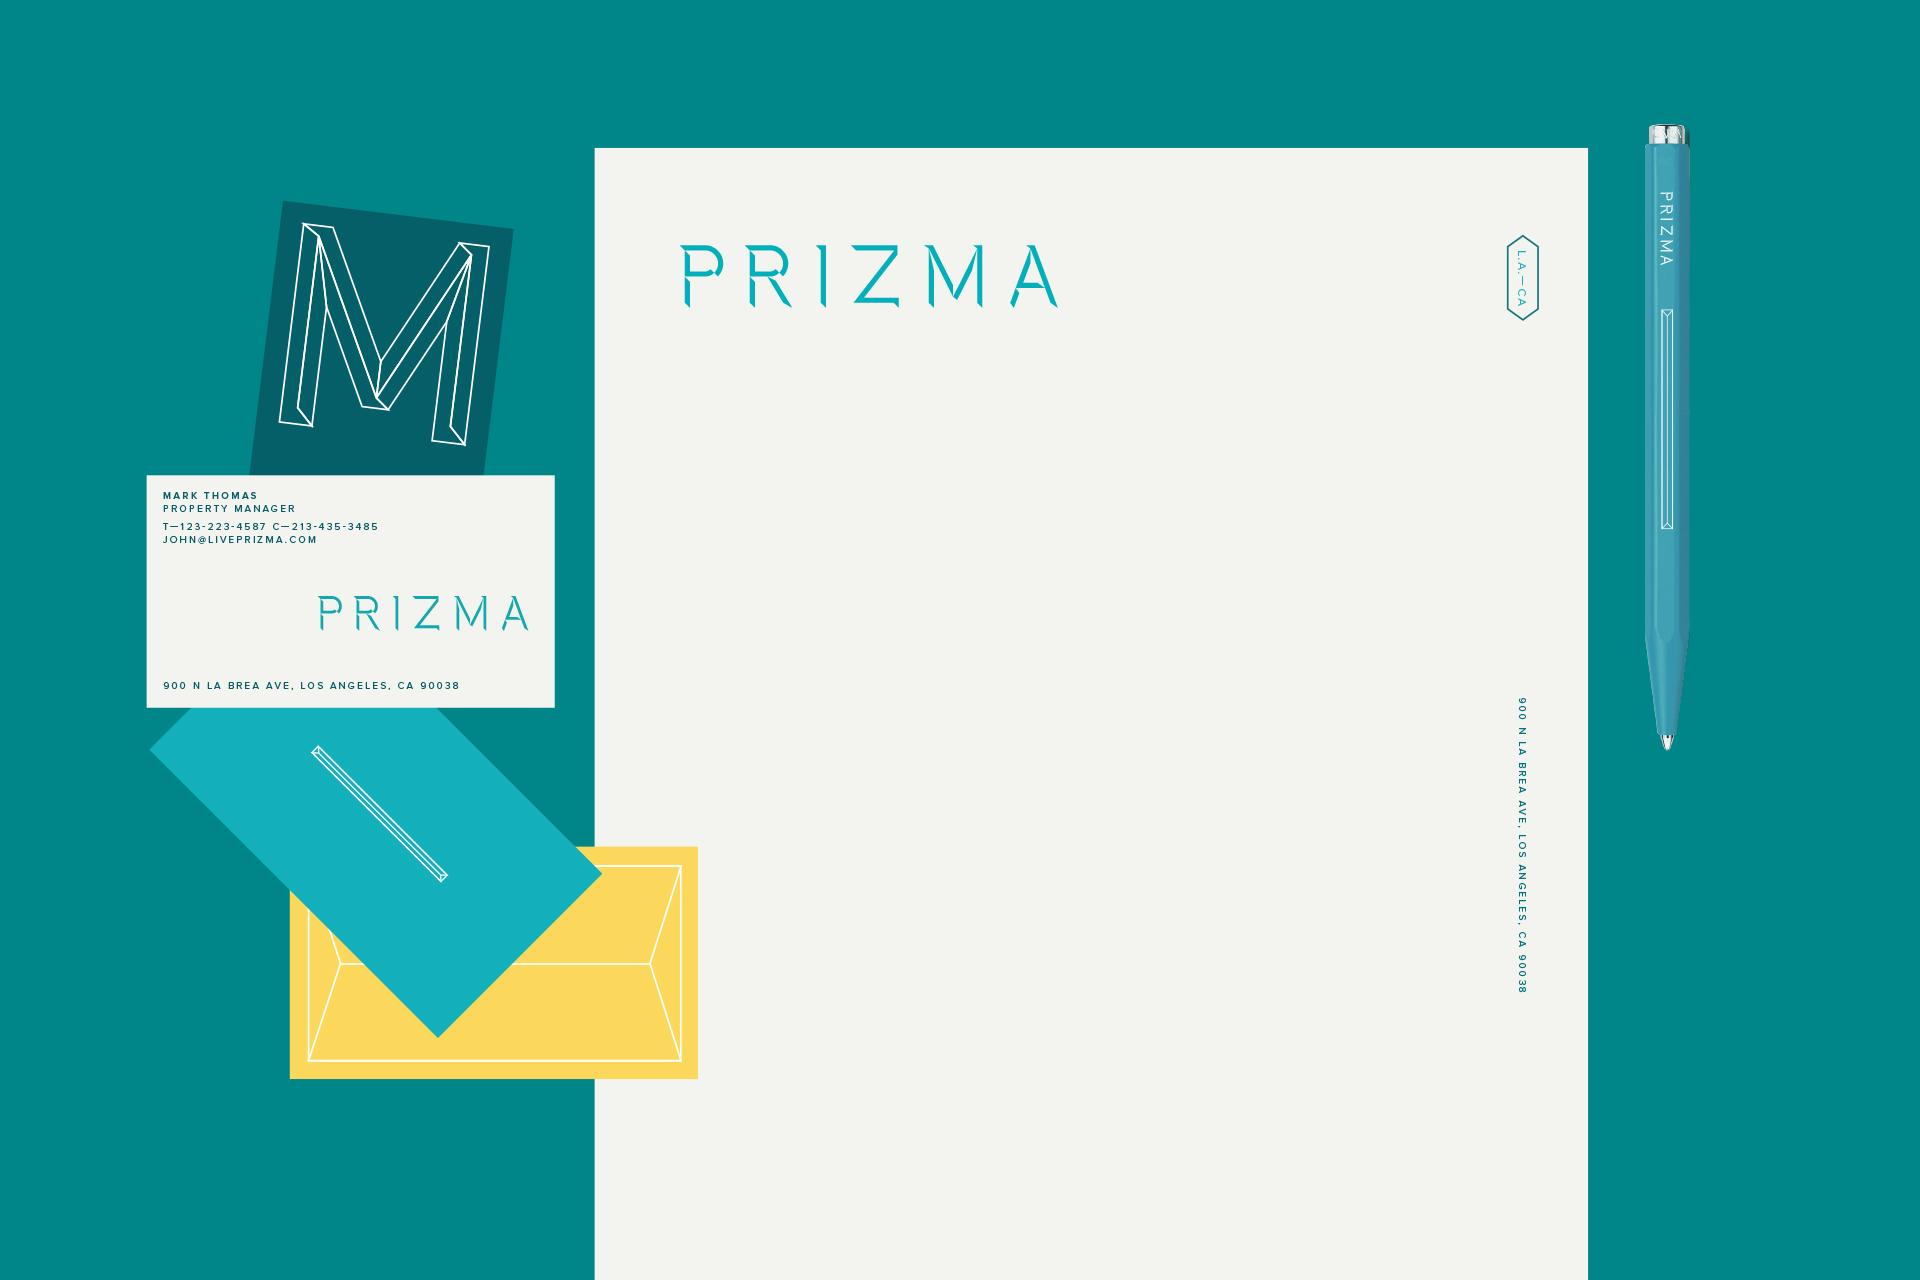 7_Prizma_Stationery